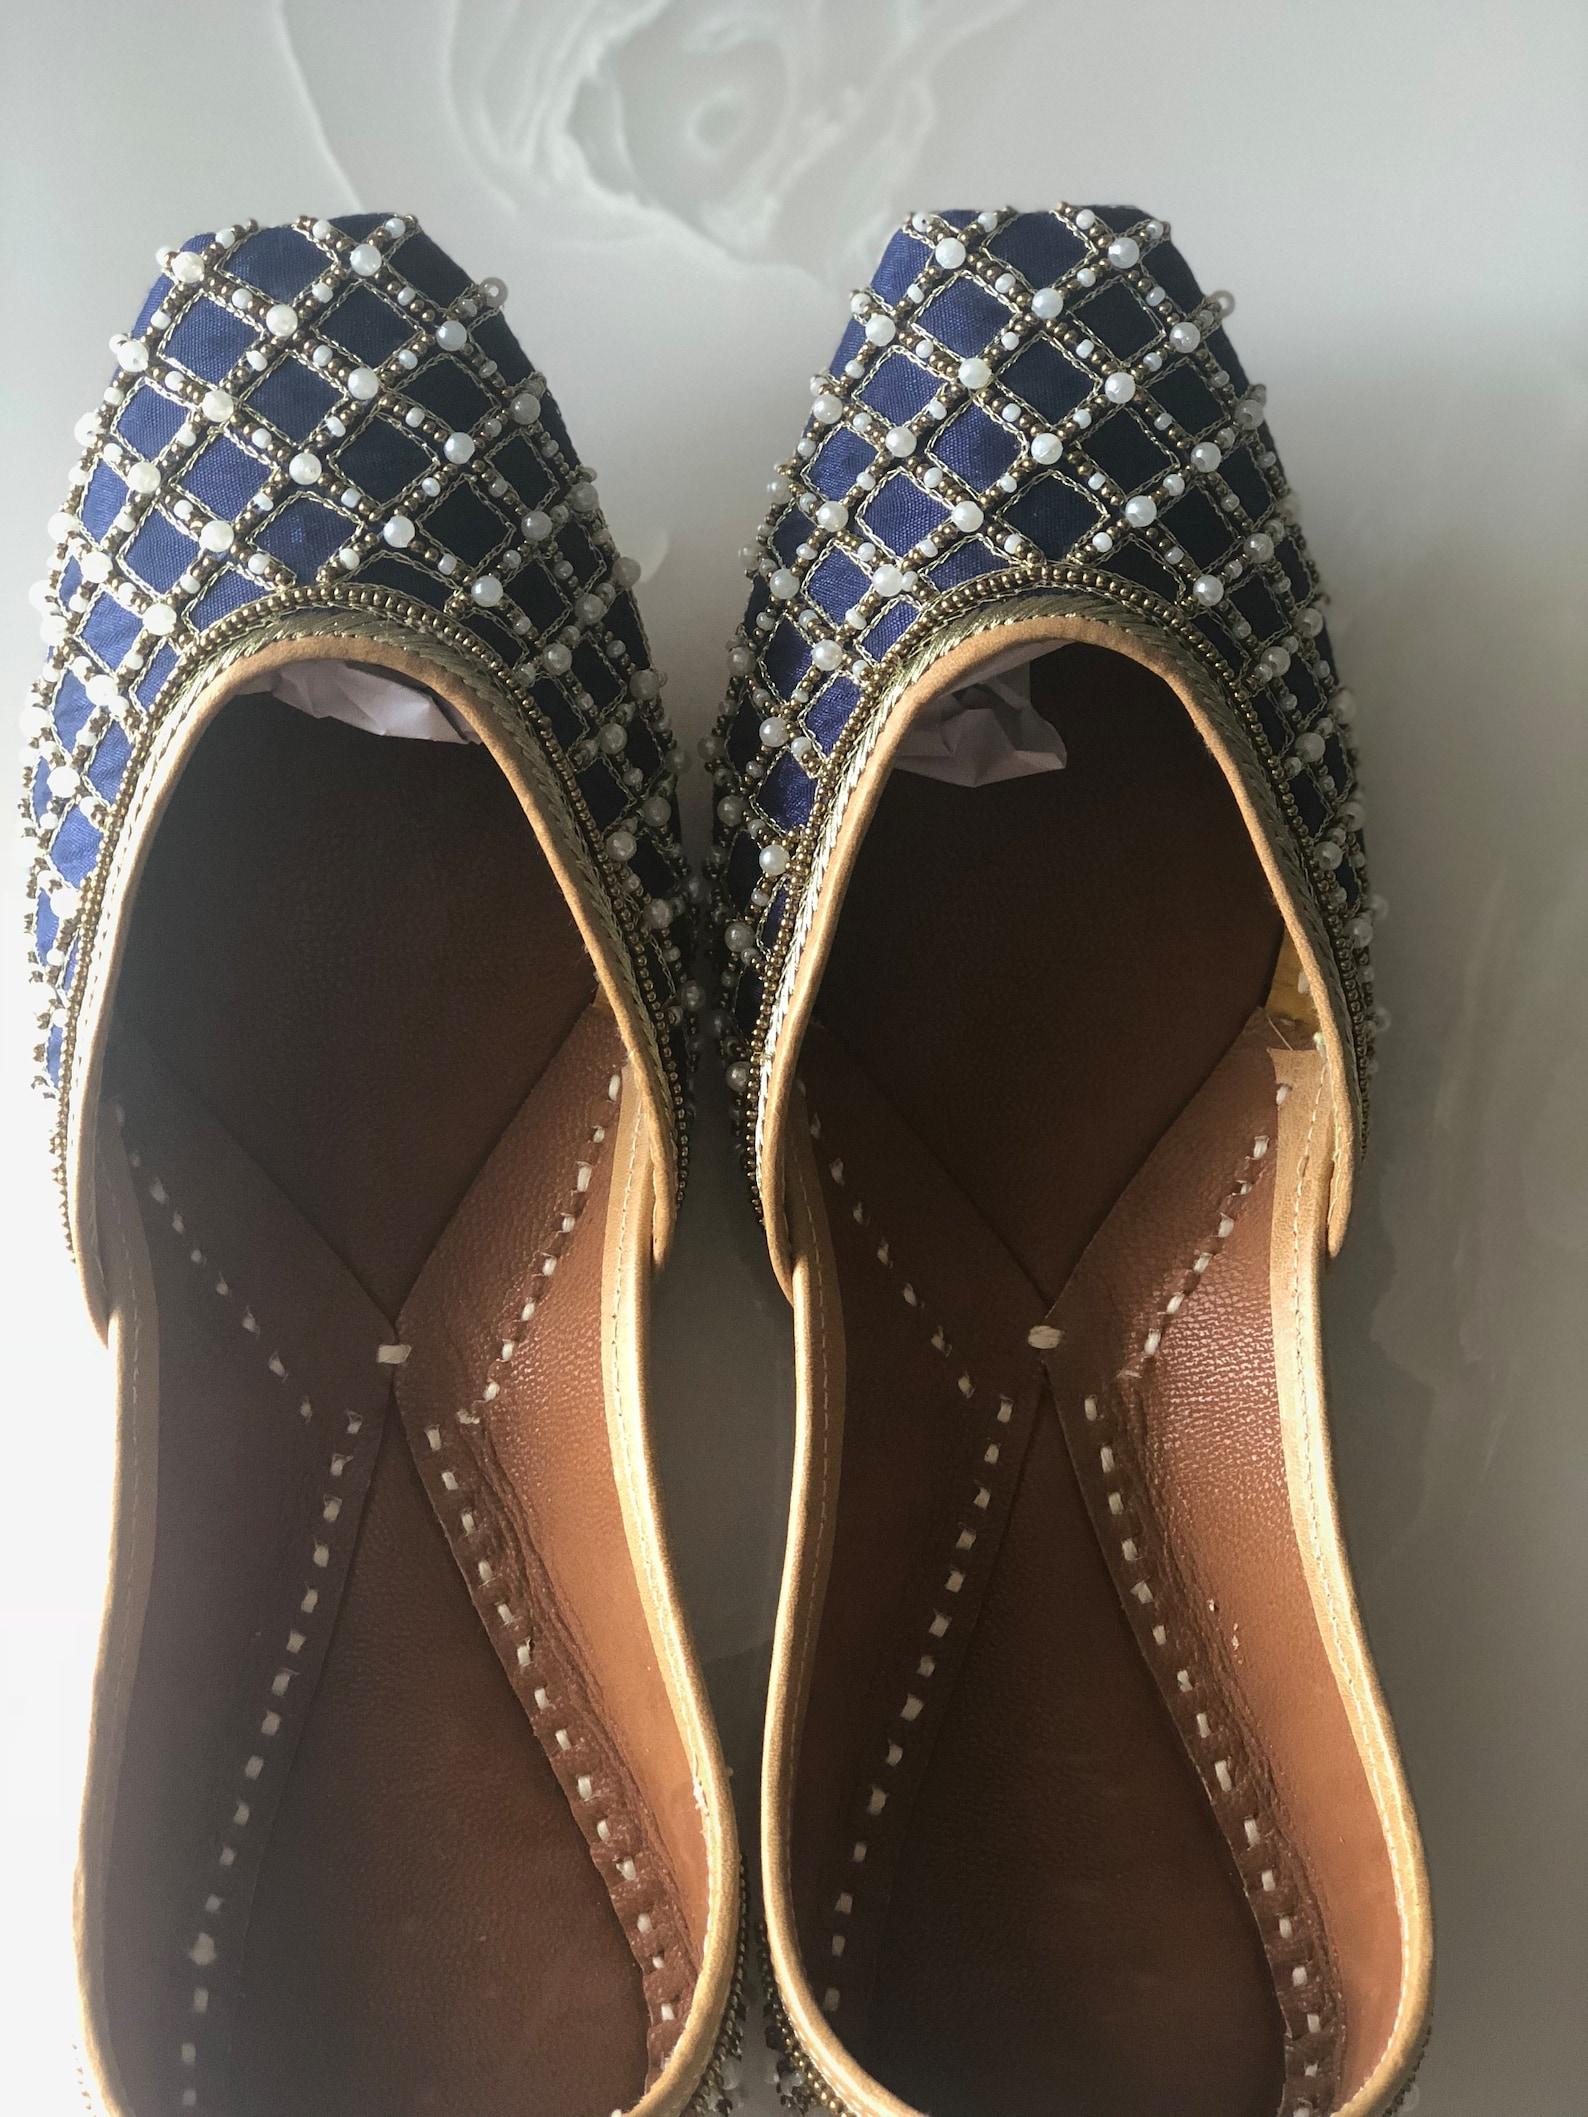 blue bridal shoes, indian ethnic juttis, embellished wedding shoes, white beaded punjabi juttis, indian footwear, blue ballet sh